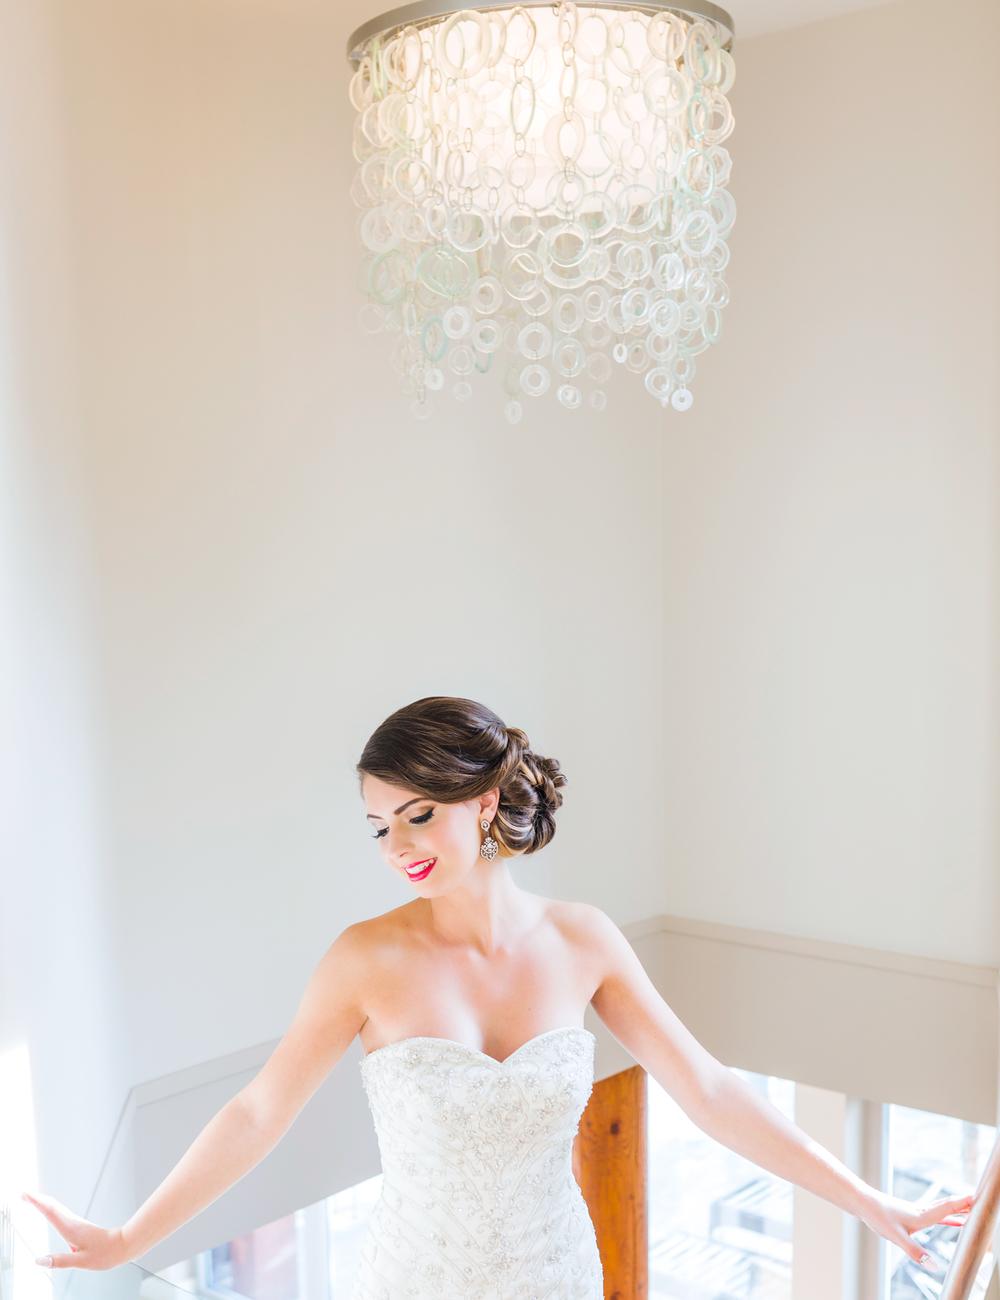 IMG_6443-BRIDAL-EDITORIAL-JENNIFER-PICARD-PHOTOGRAPHY-FINE-ART-WEDDINGS.jpg